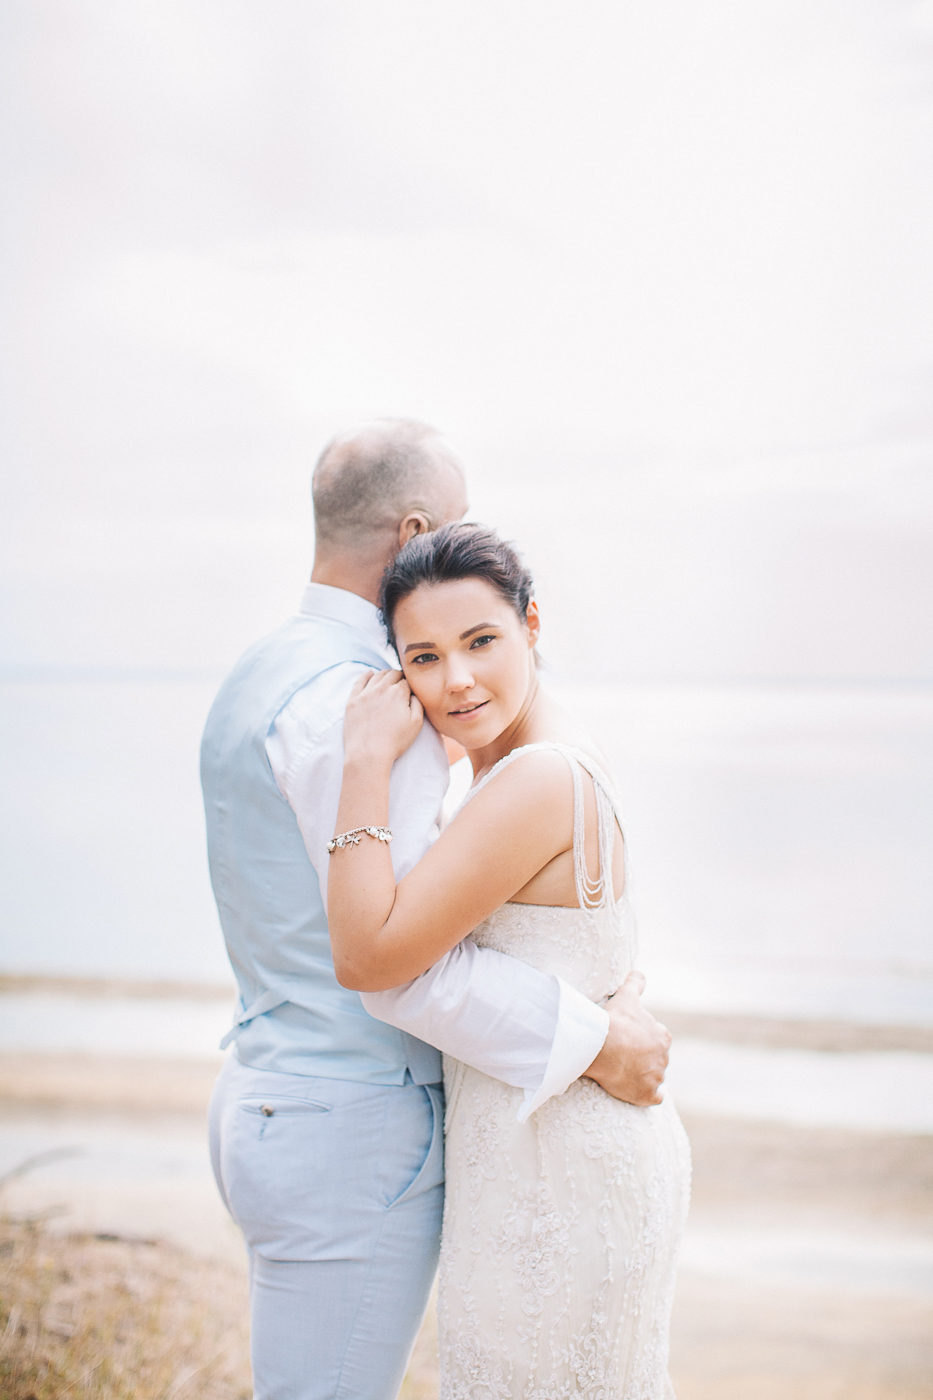 wedding_goryacheva_anna-49